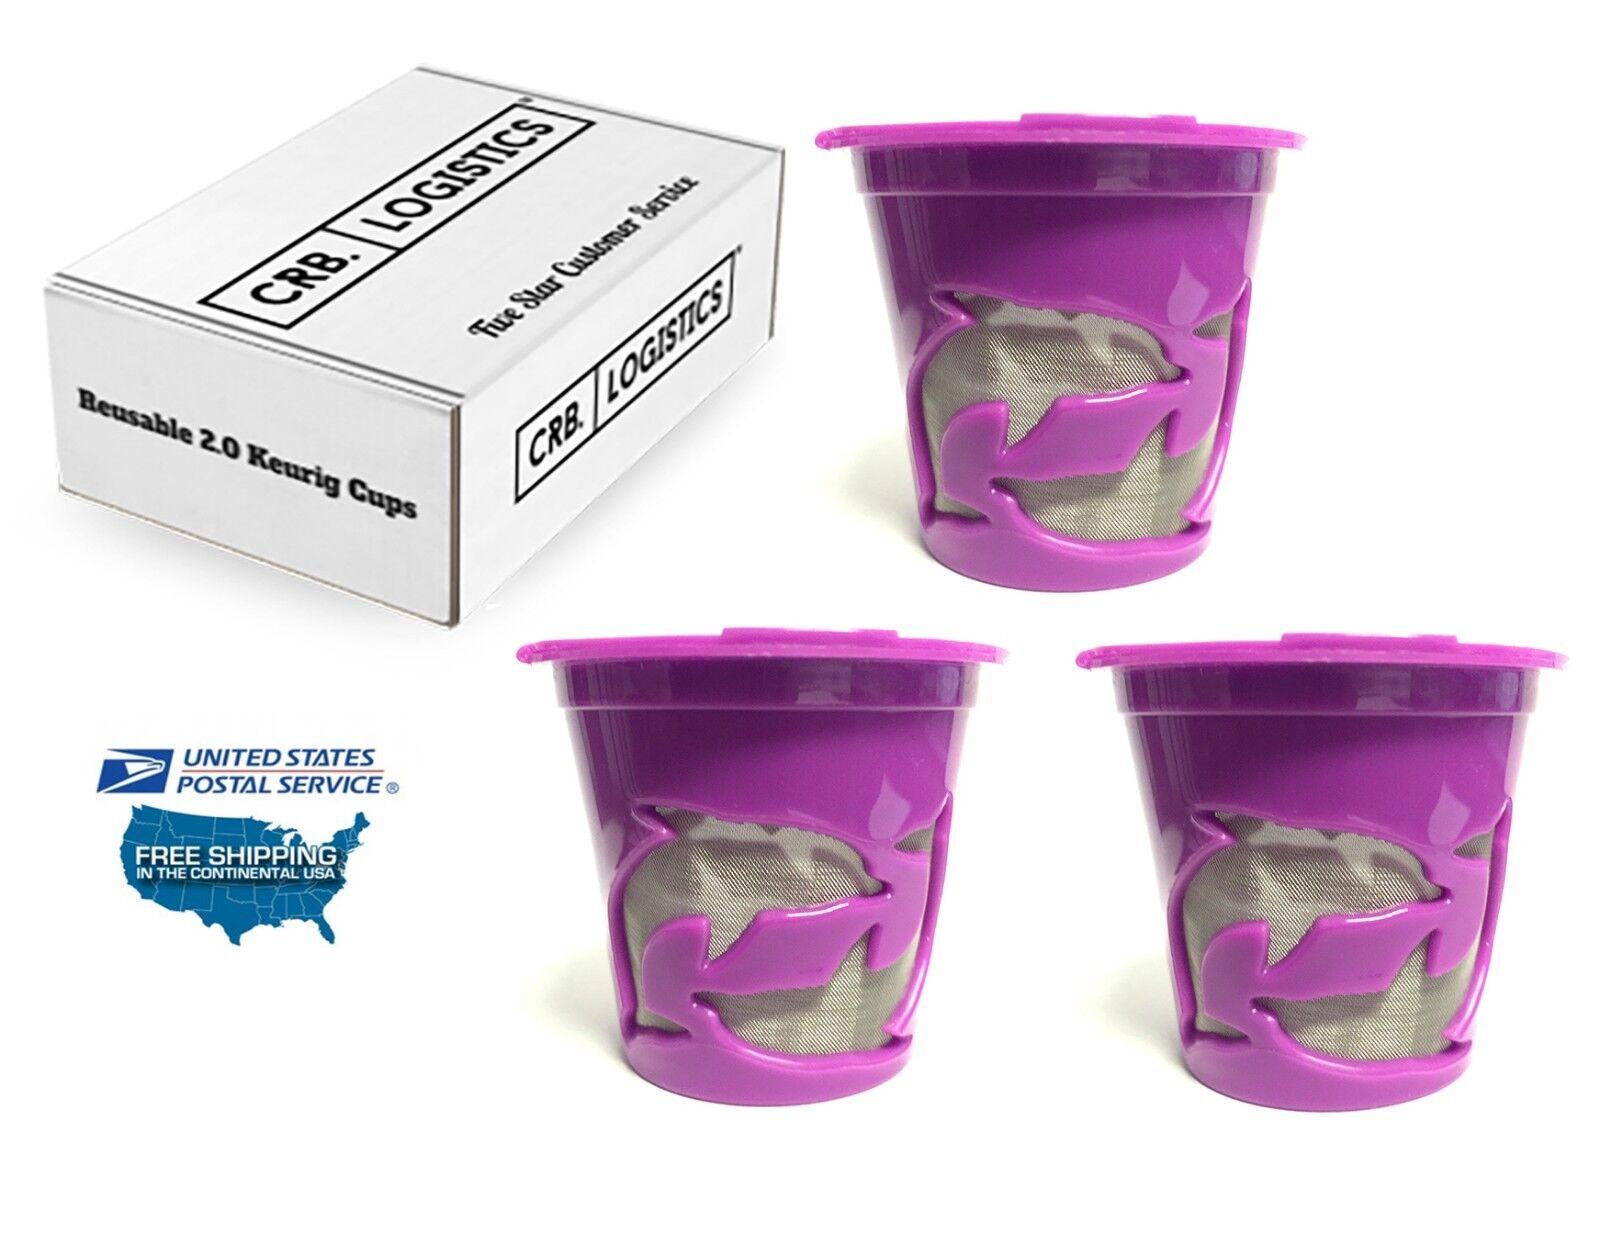 3 Reusable K cups